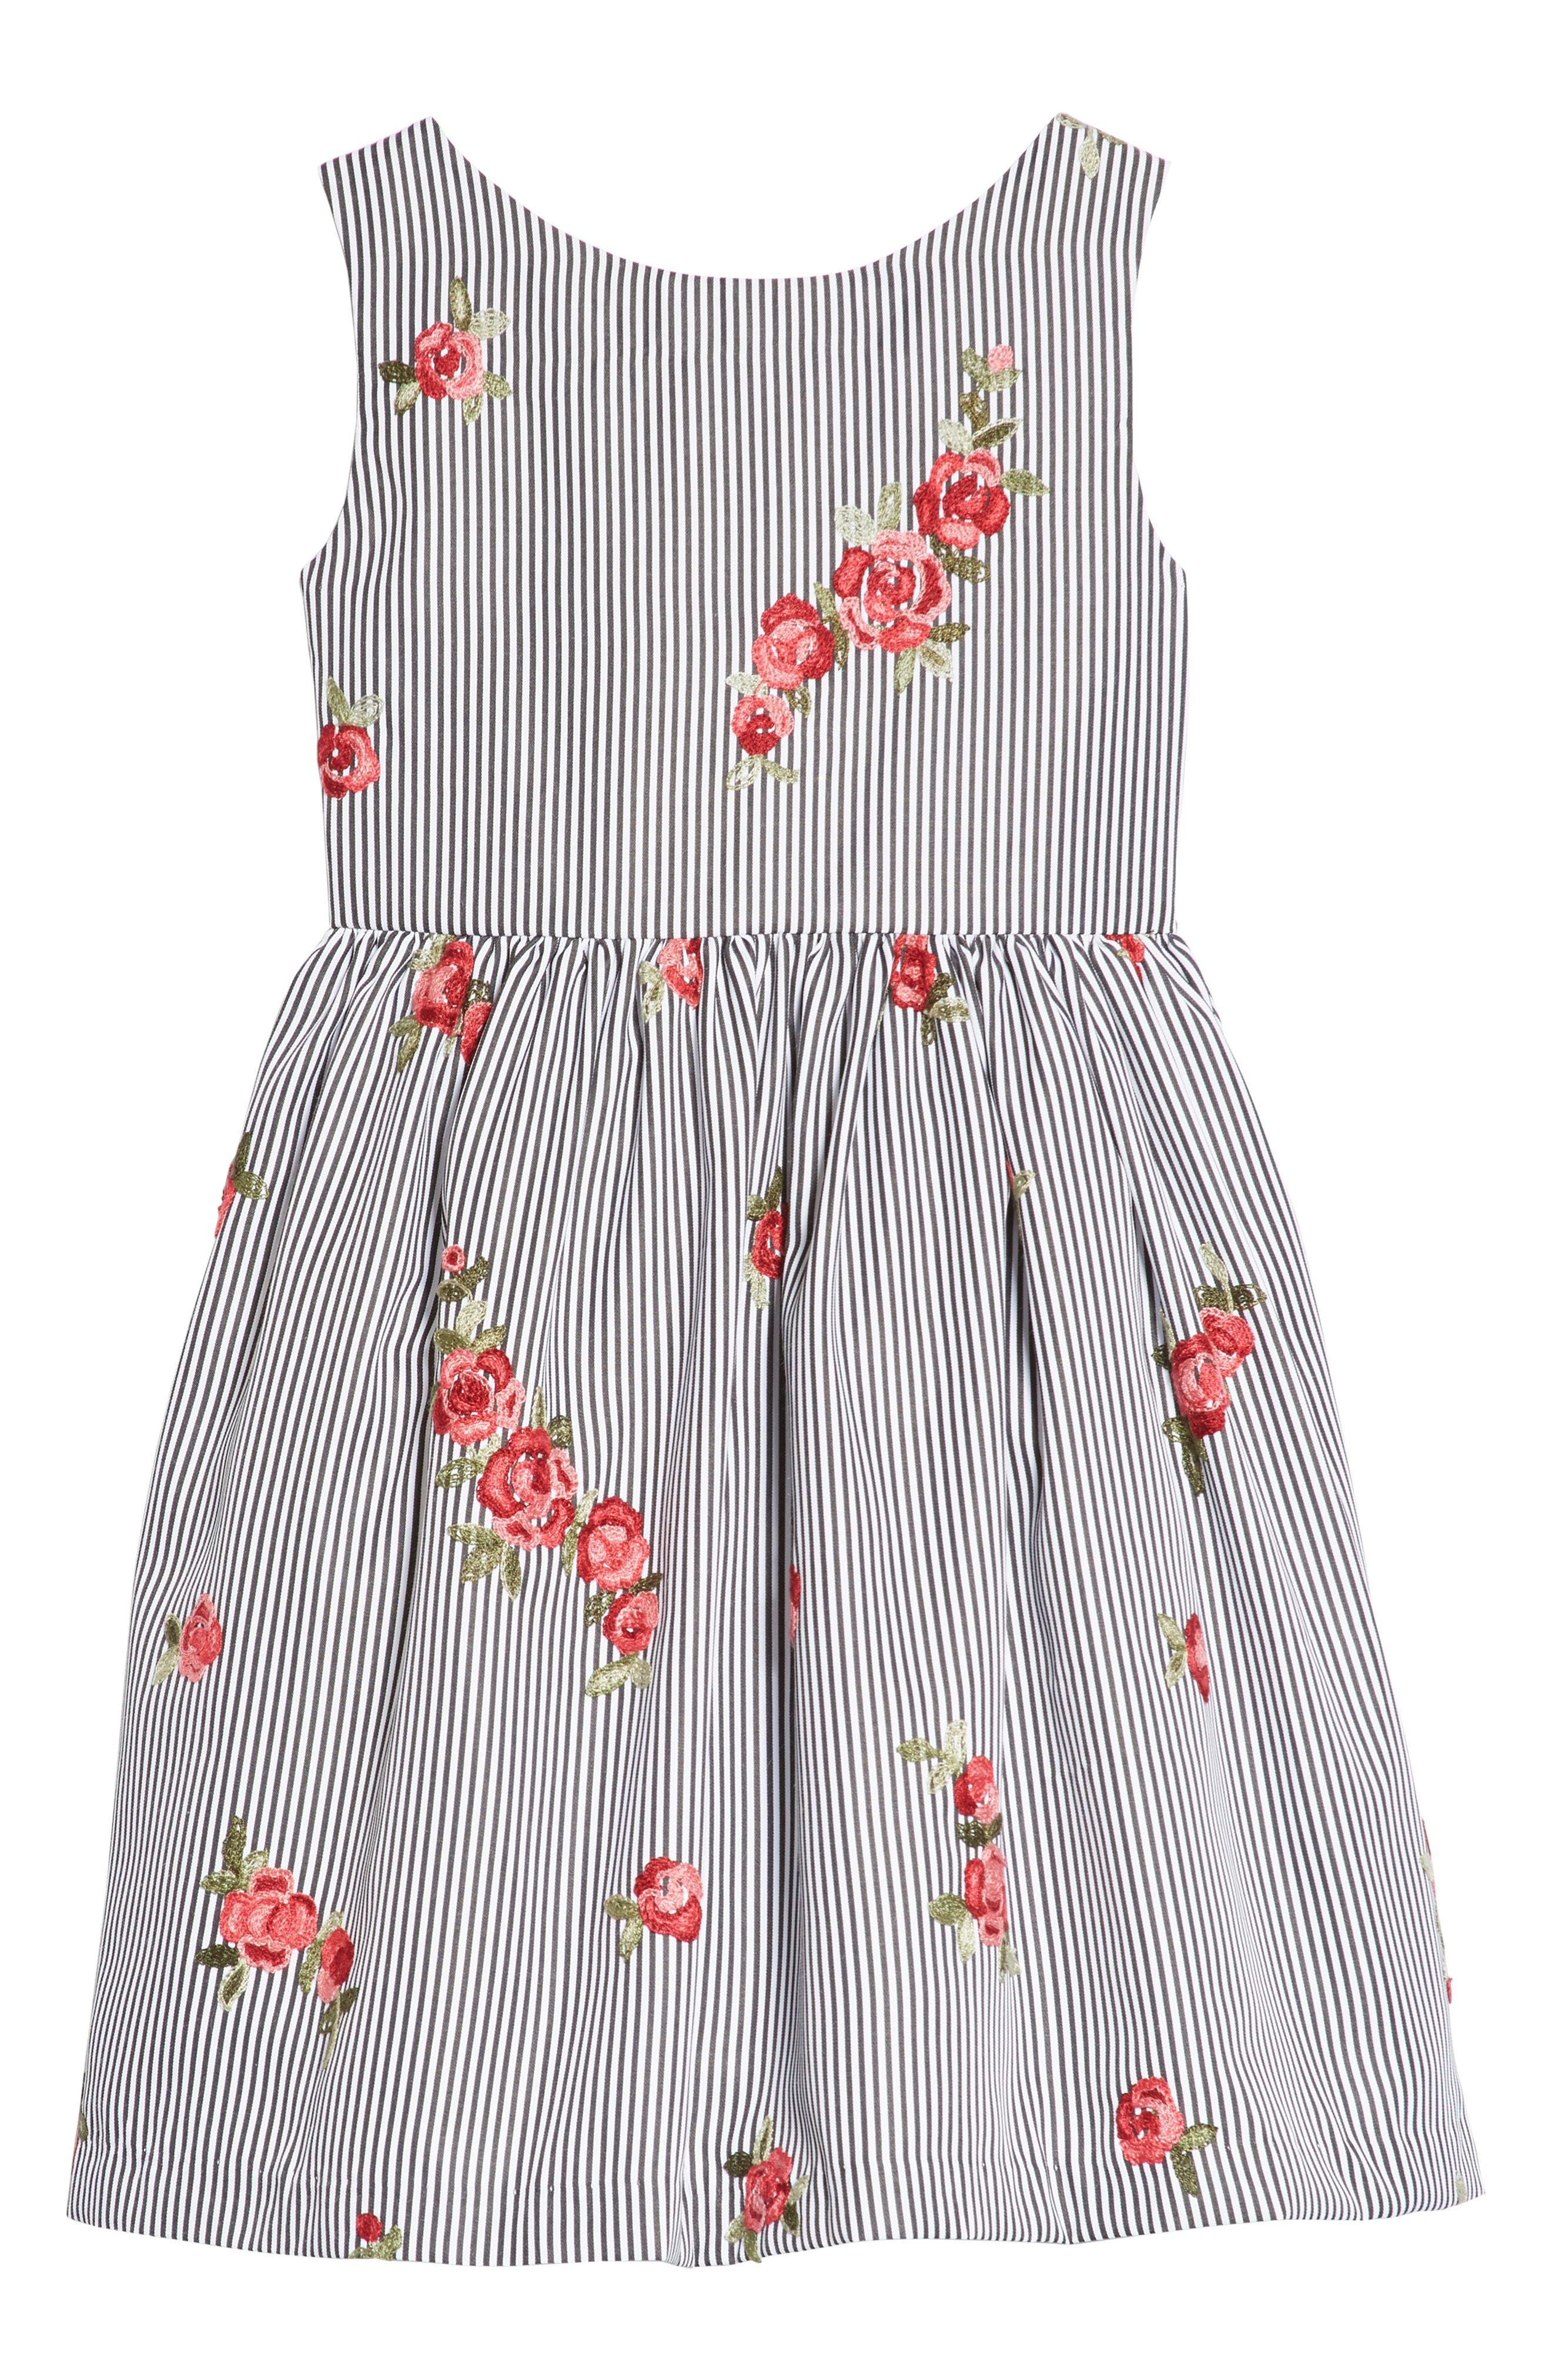 Alternate Image 1 Selected - Frais Embroidered Stripe Dress (Toddler Girls, Little Girls & Big Girls)